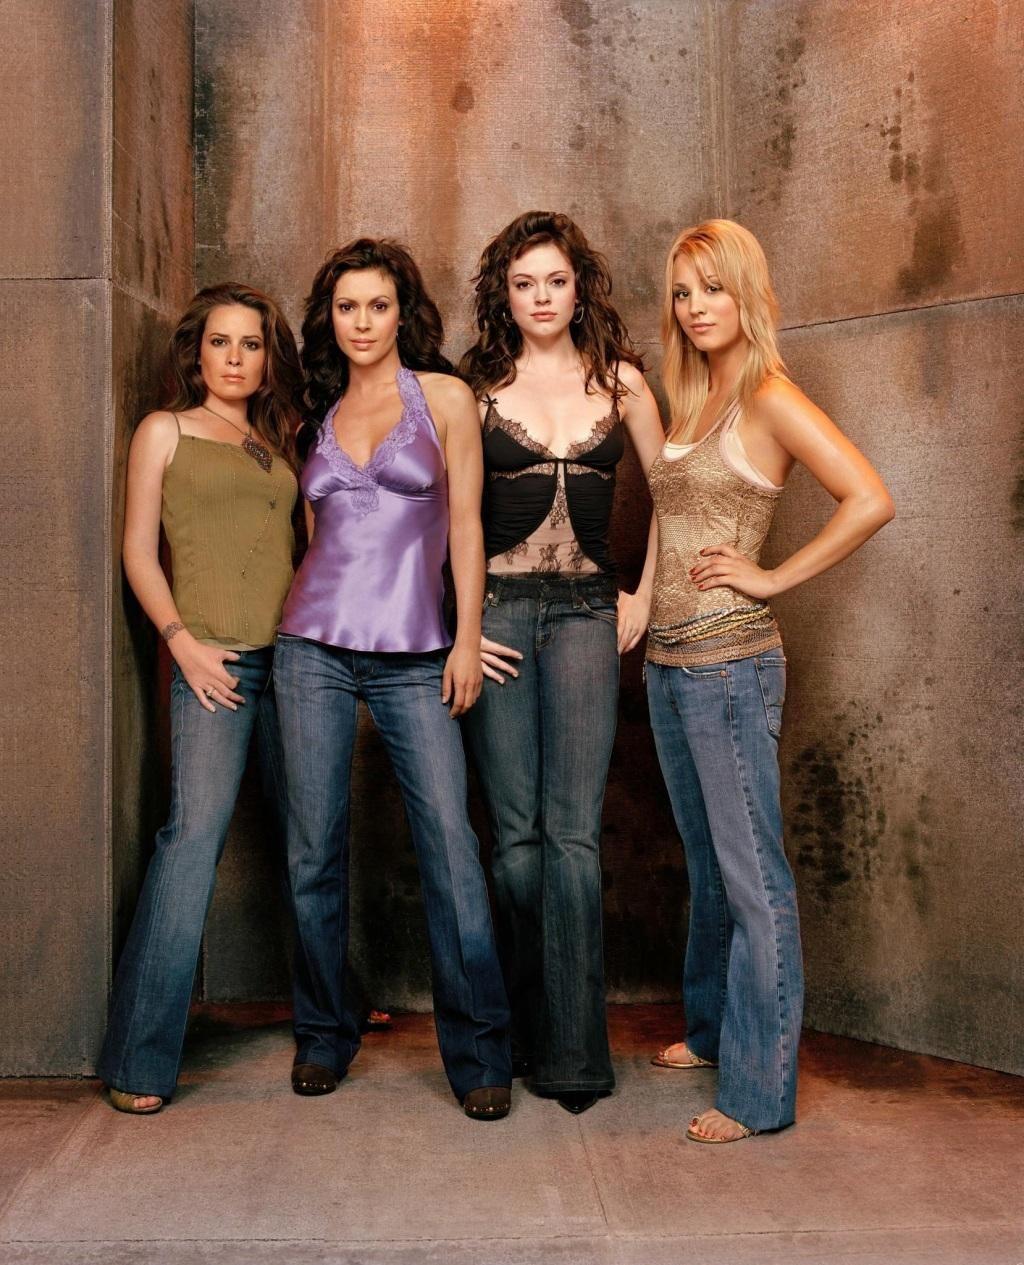 Charmed season 6 cast Holly Marie Combs, Alyssa Milano, Rose